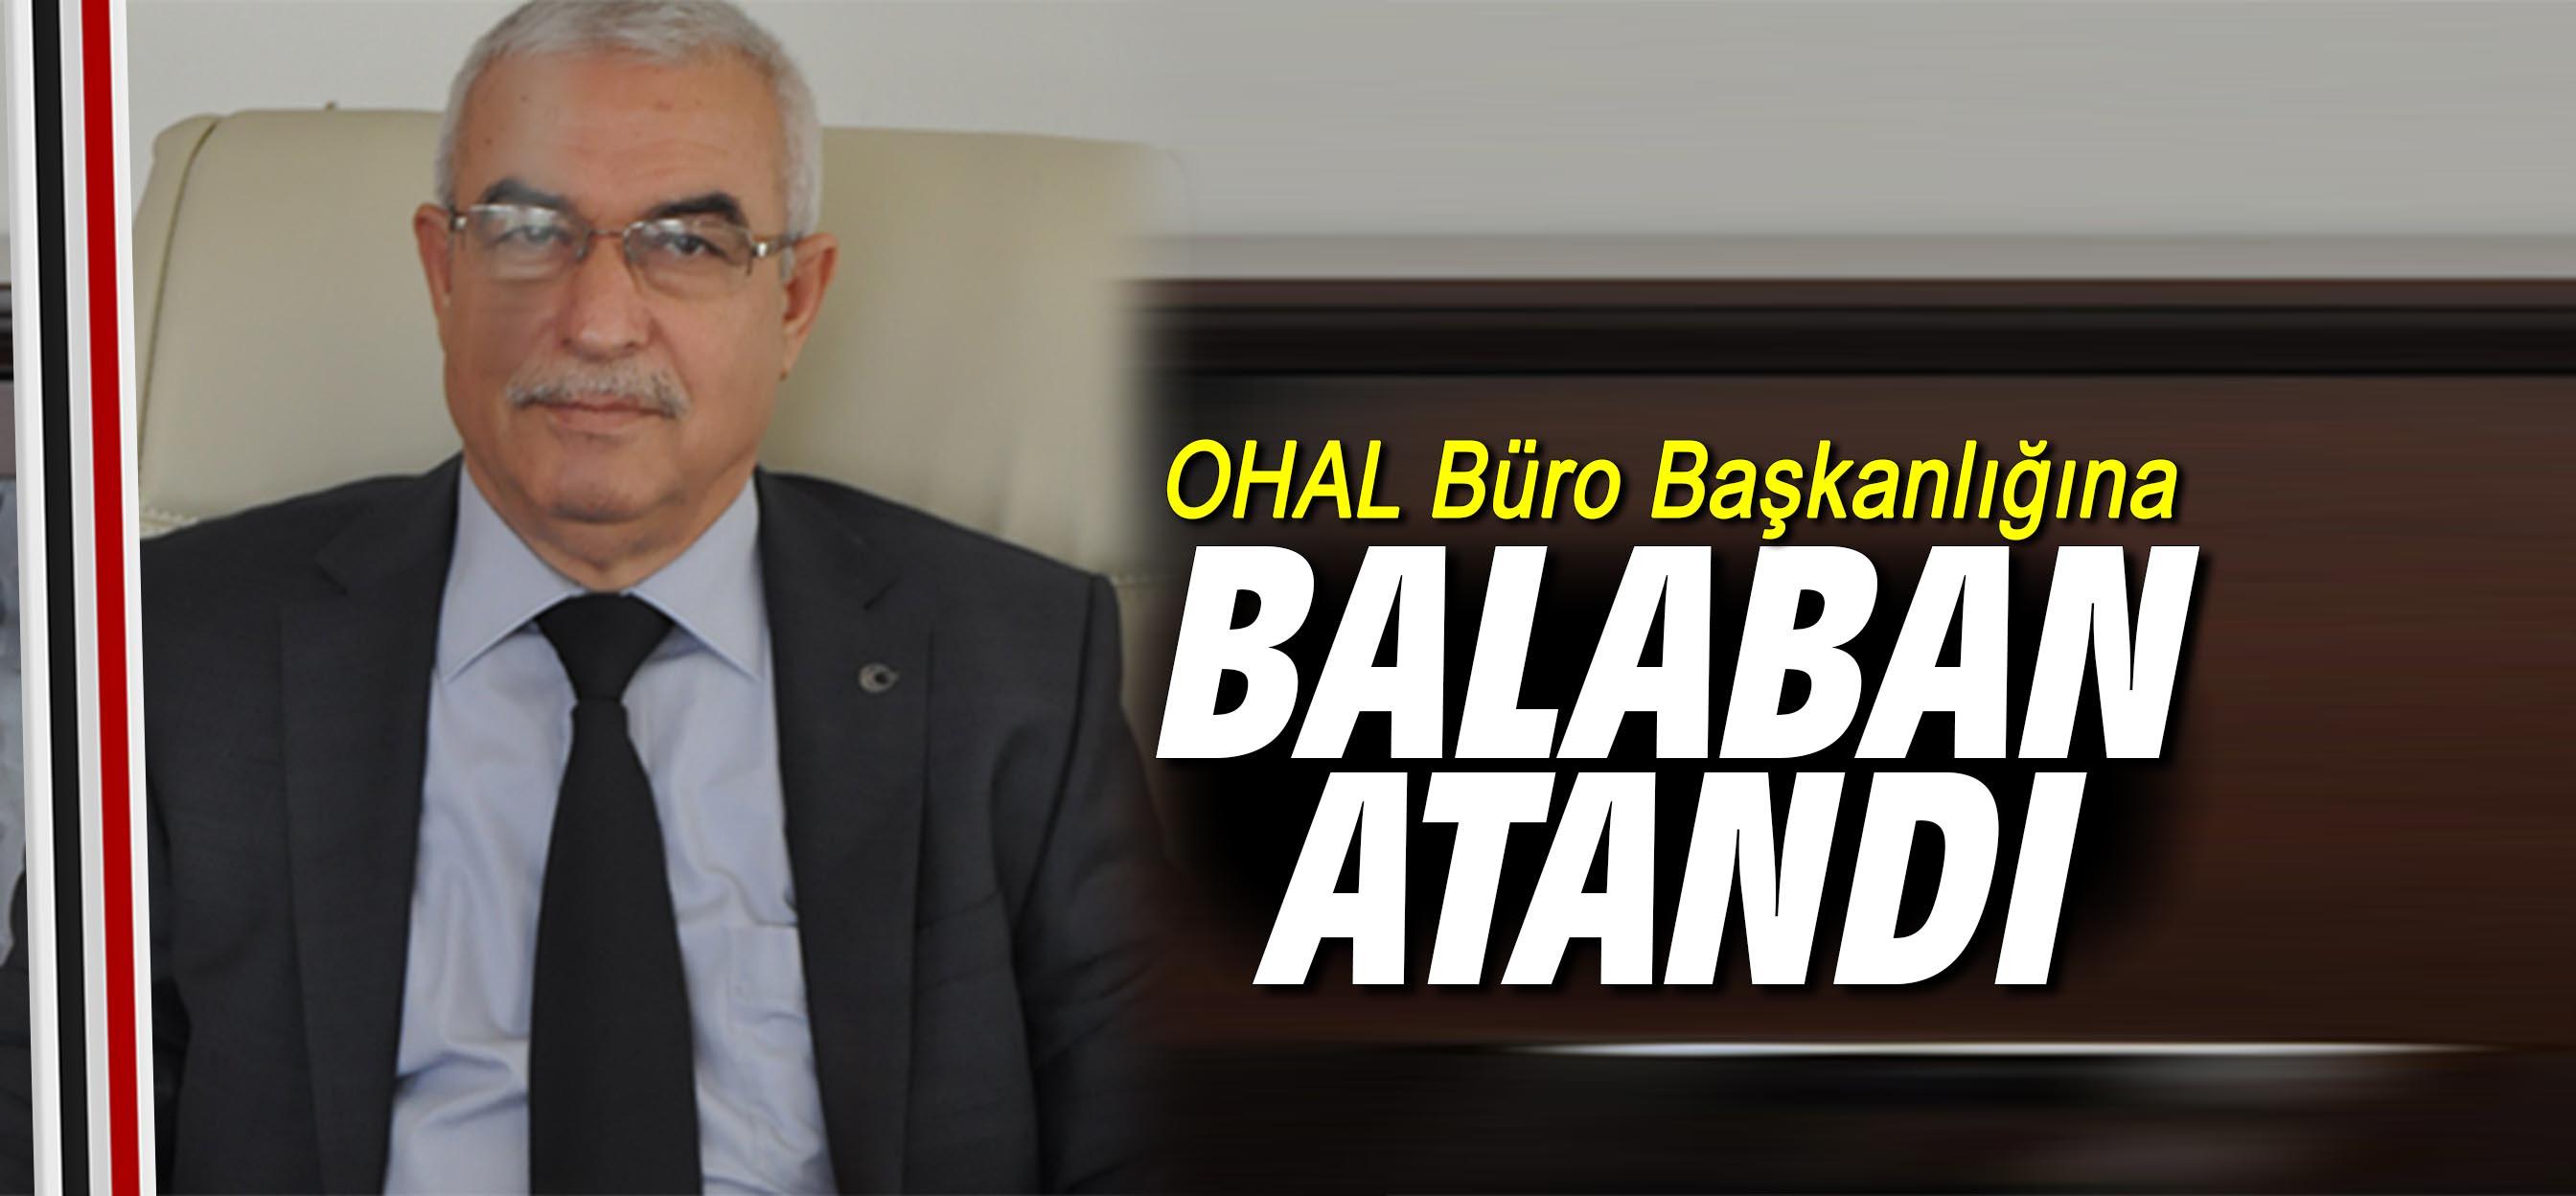 OHAL Büro Başkanlığına Balaban atandı